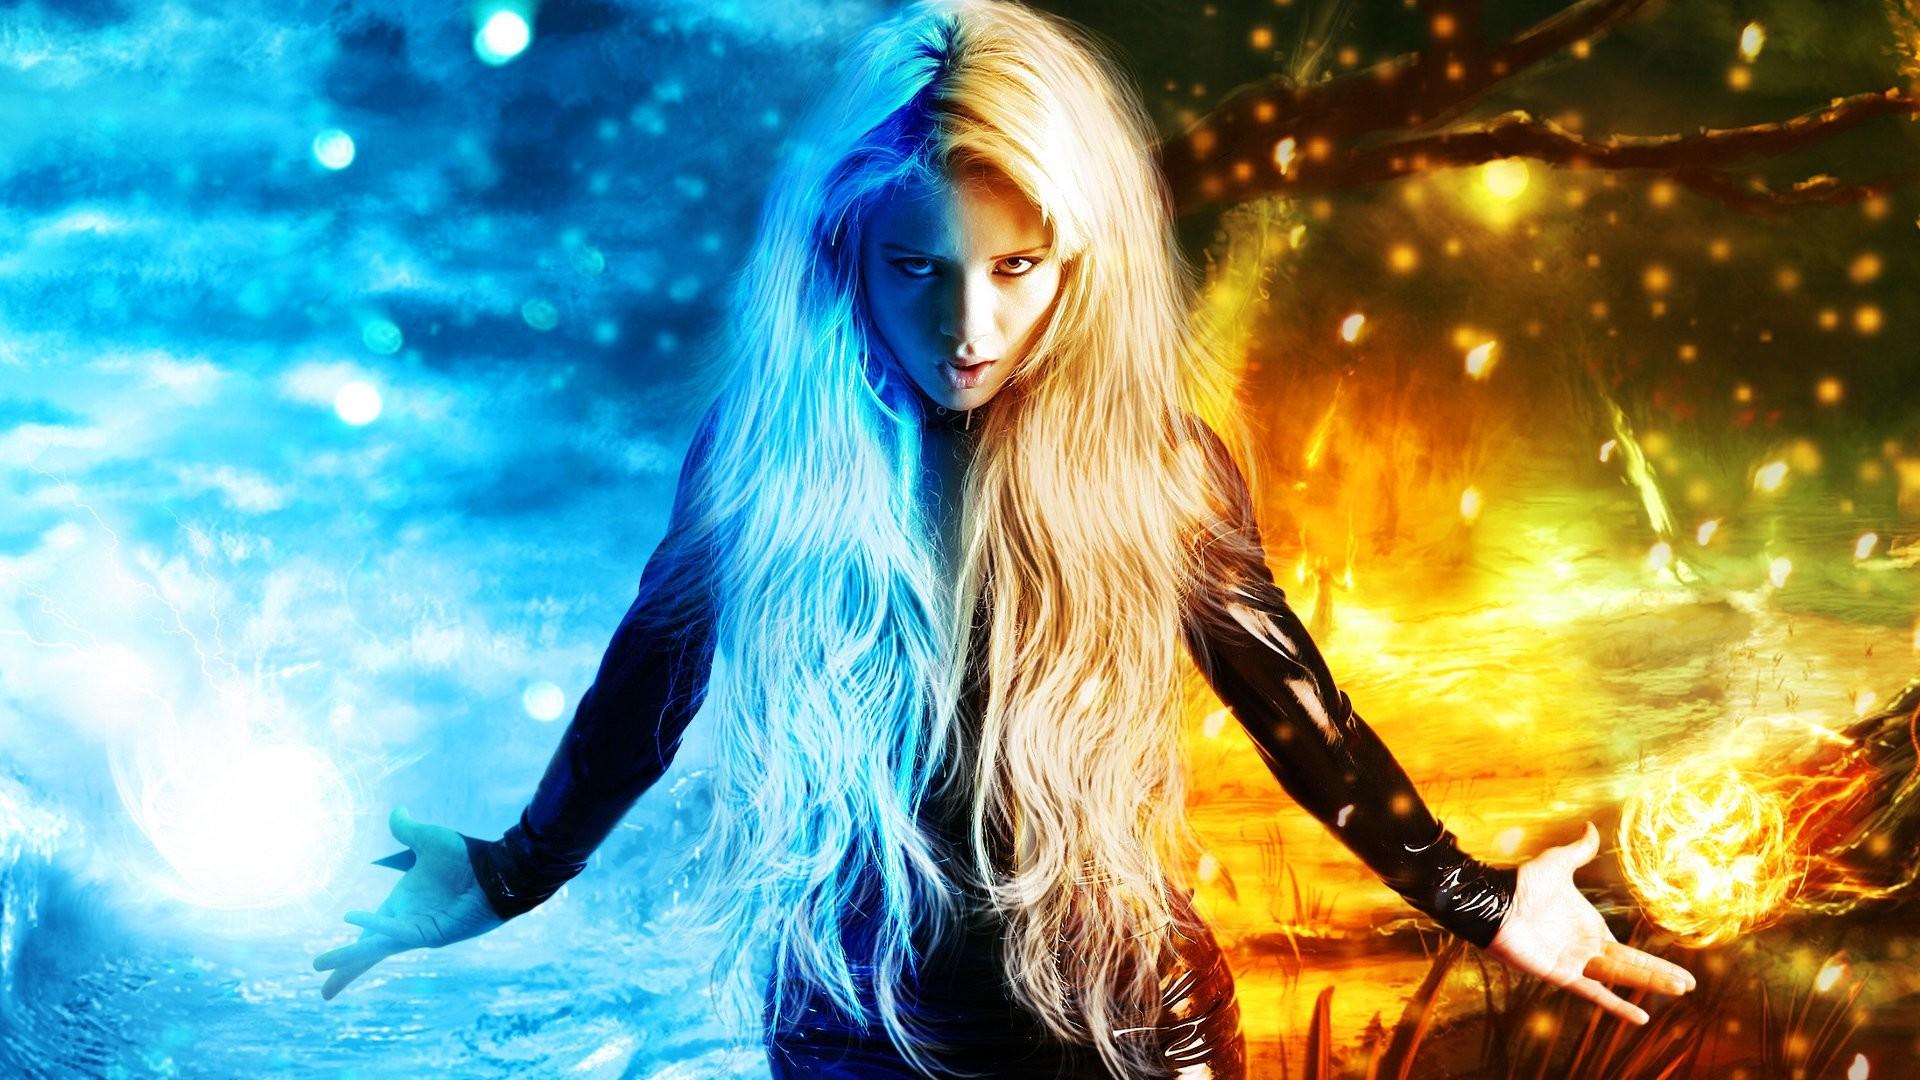 Fantasy – Magic Wallpaper